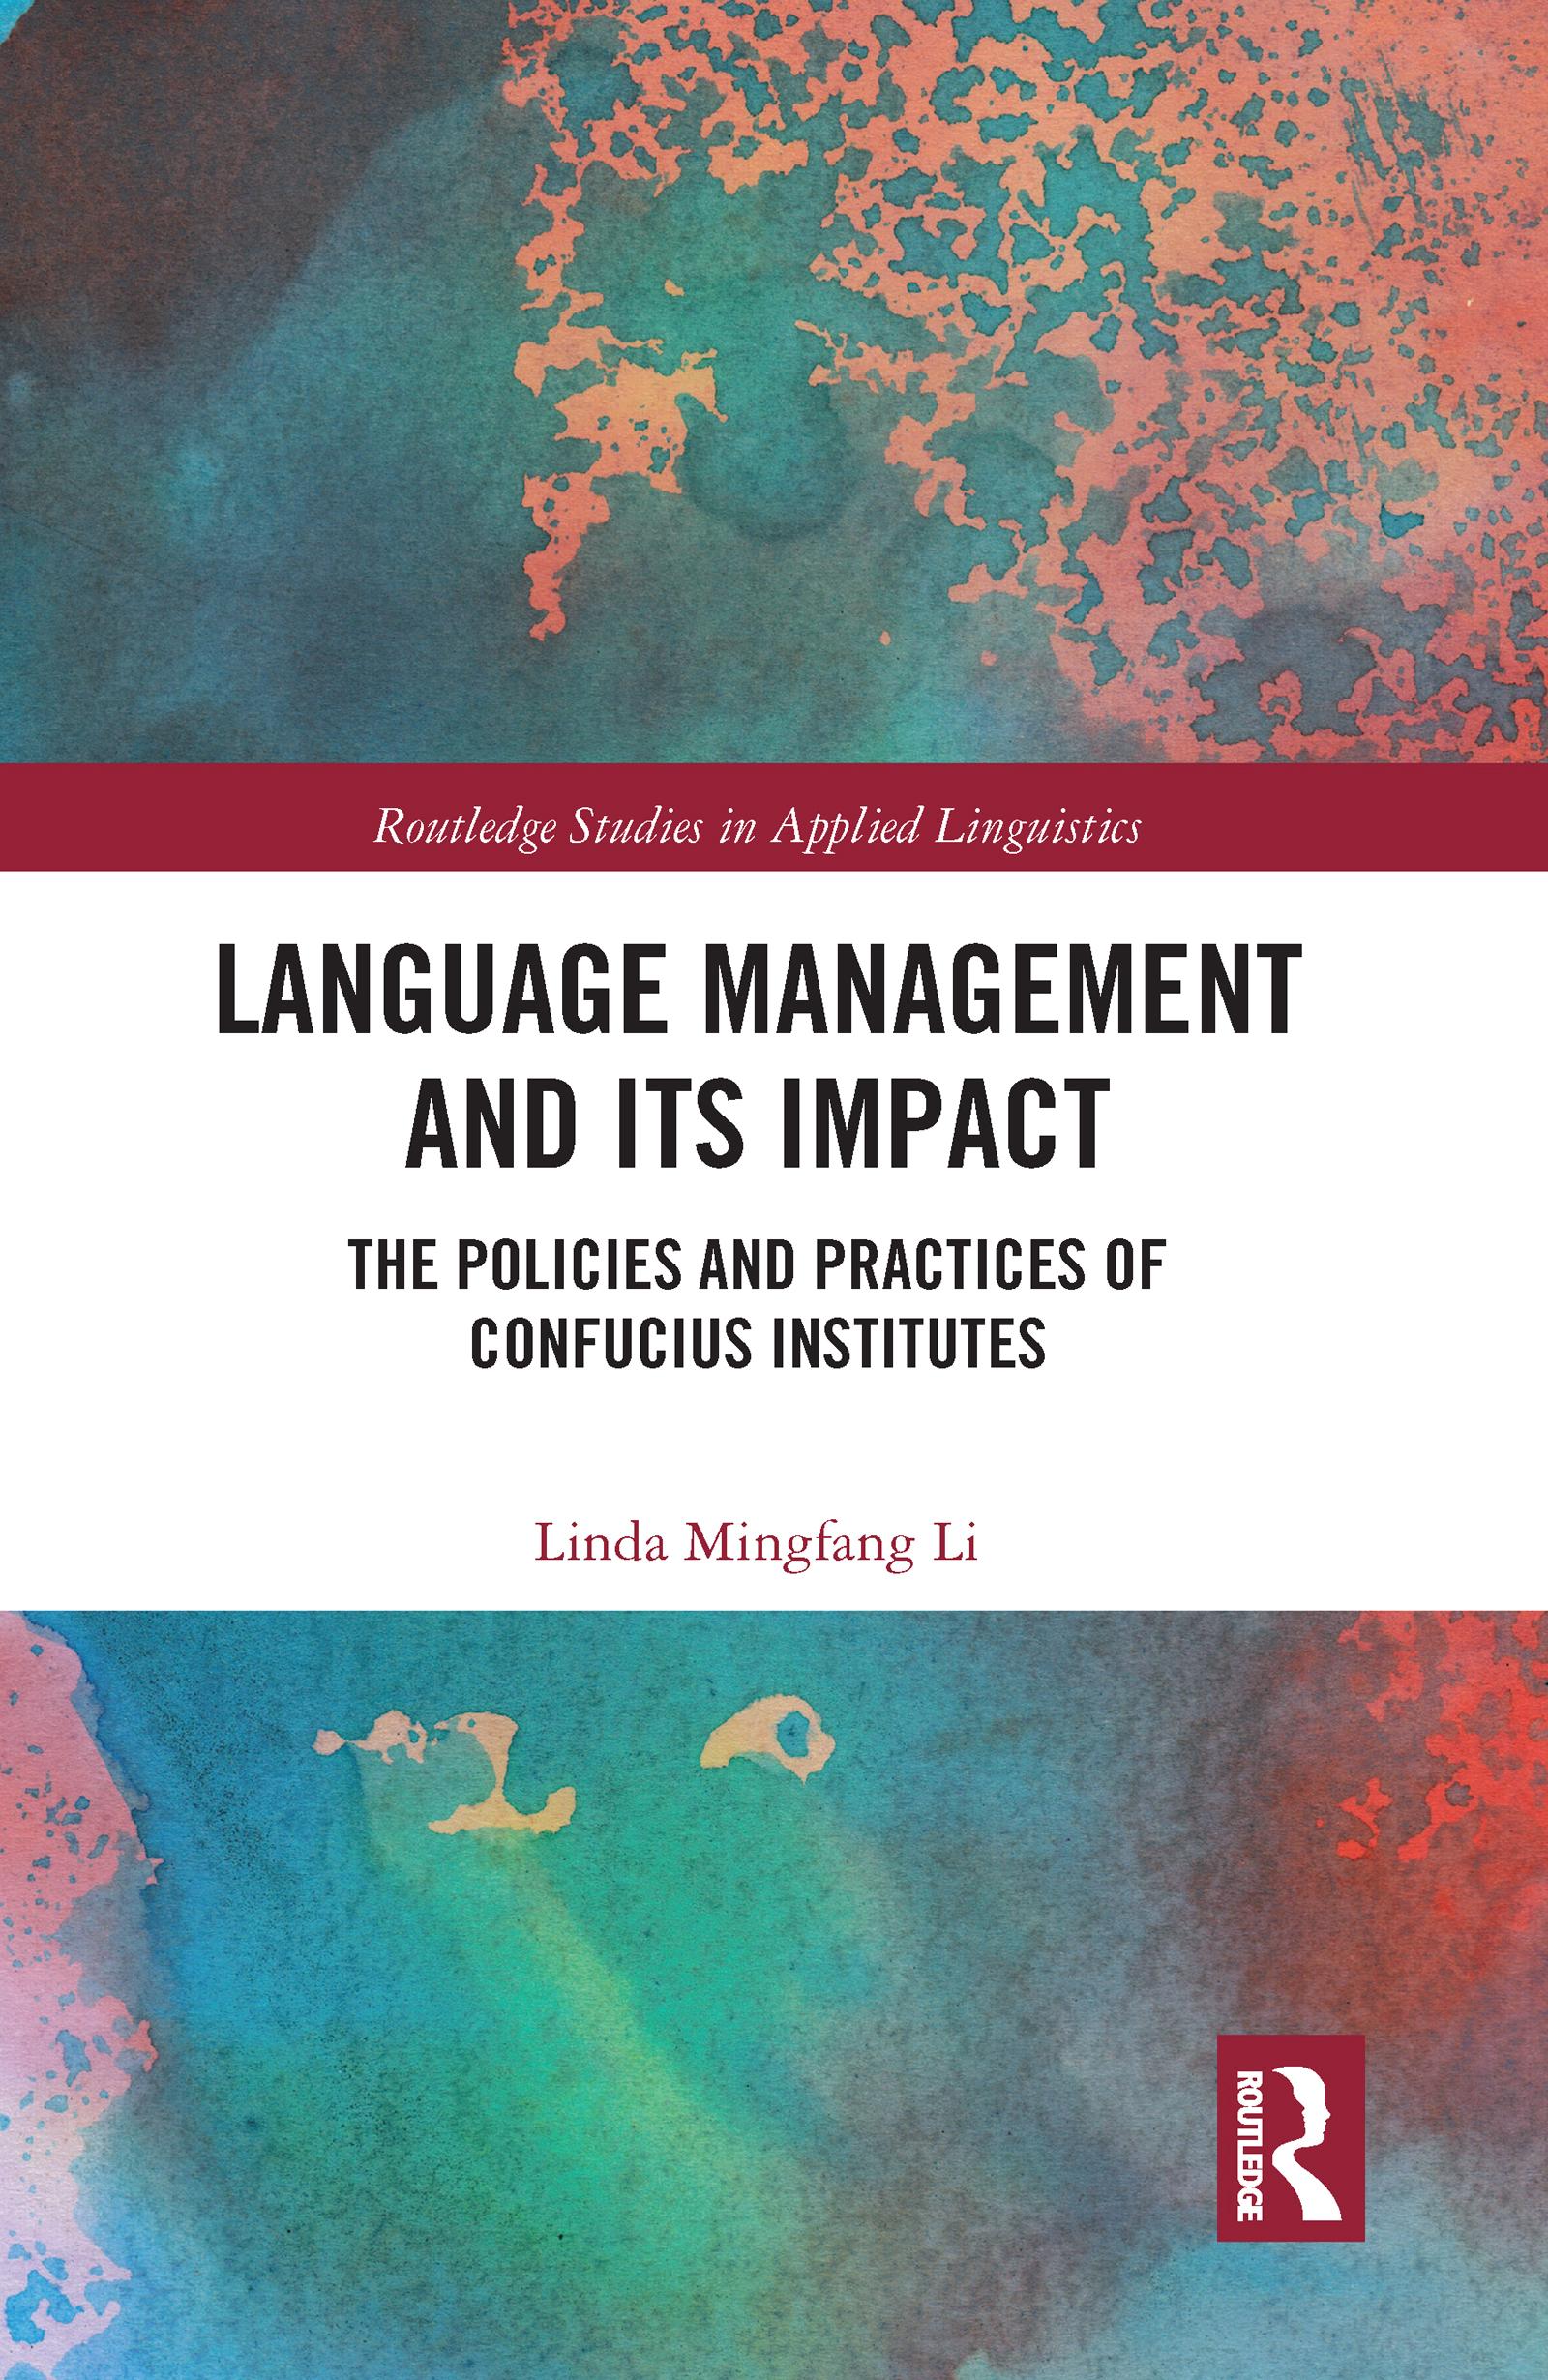 Language Management and Its Impact